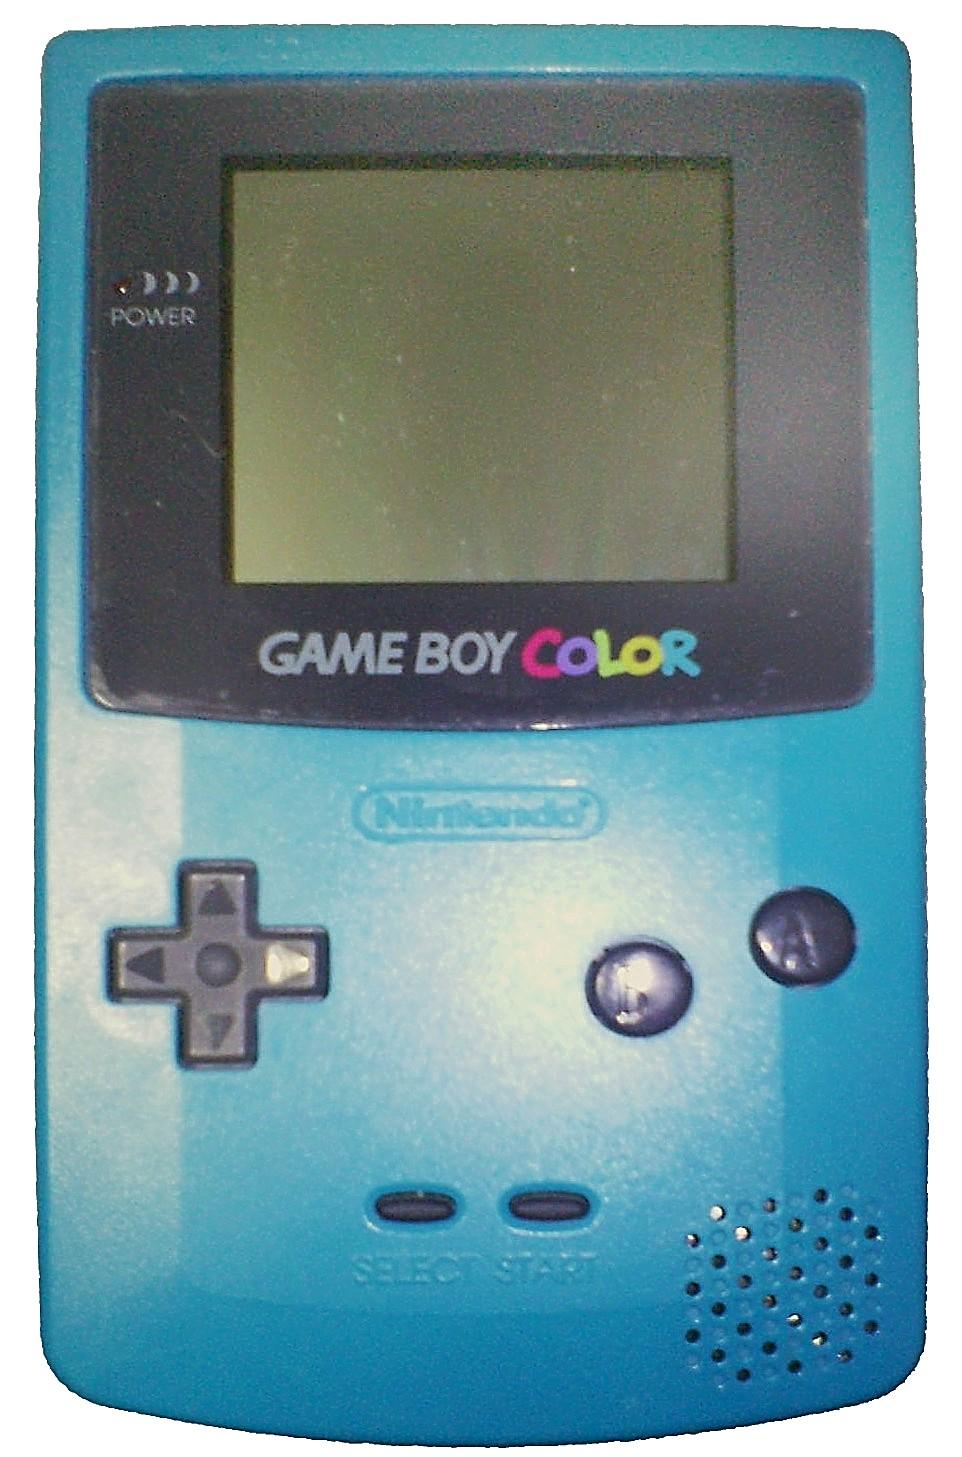 Imagen de la consola portátil Nintendo Game Boy Color, 1998, Fotografía: PiaCarrot (cc:by-sa)